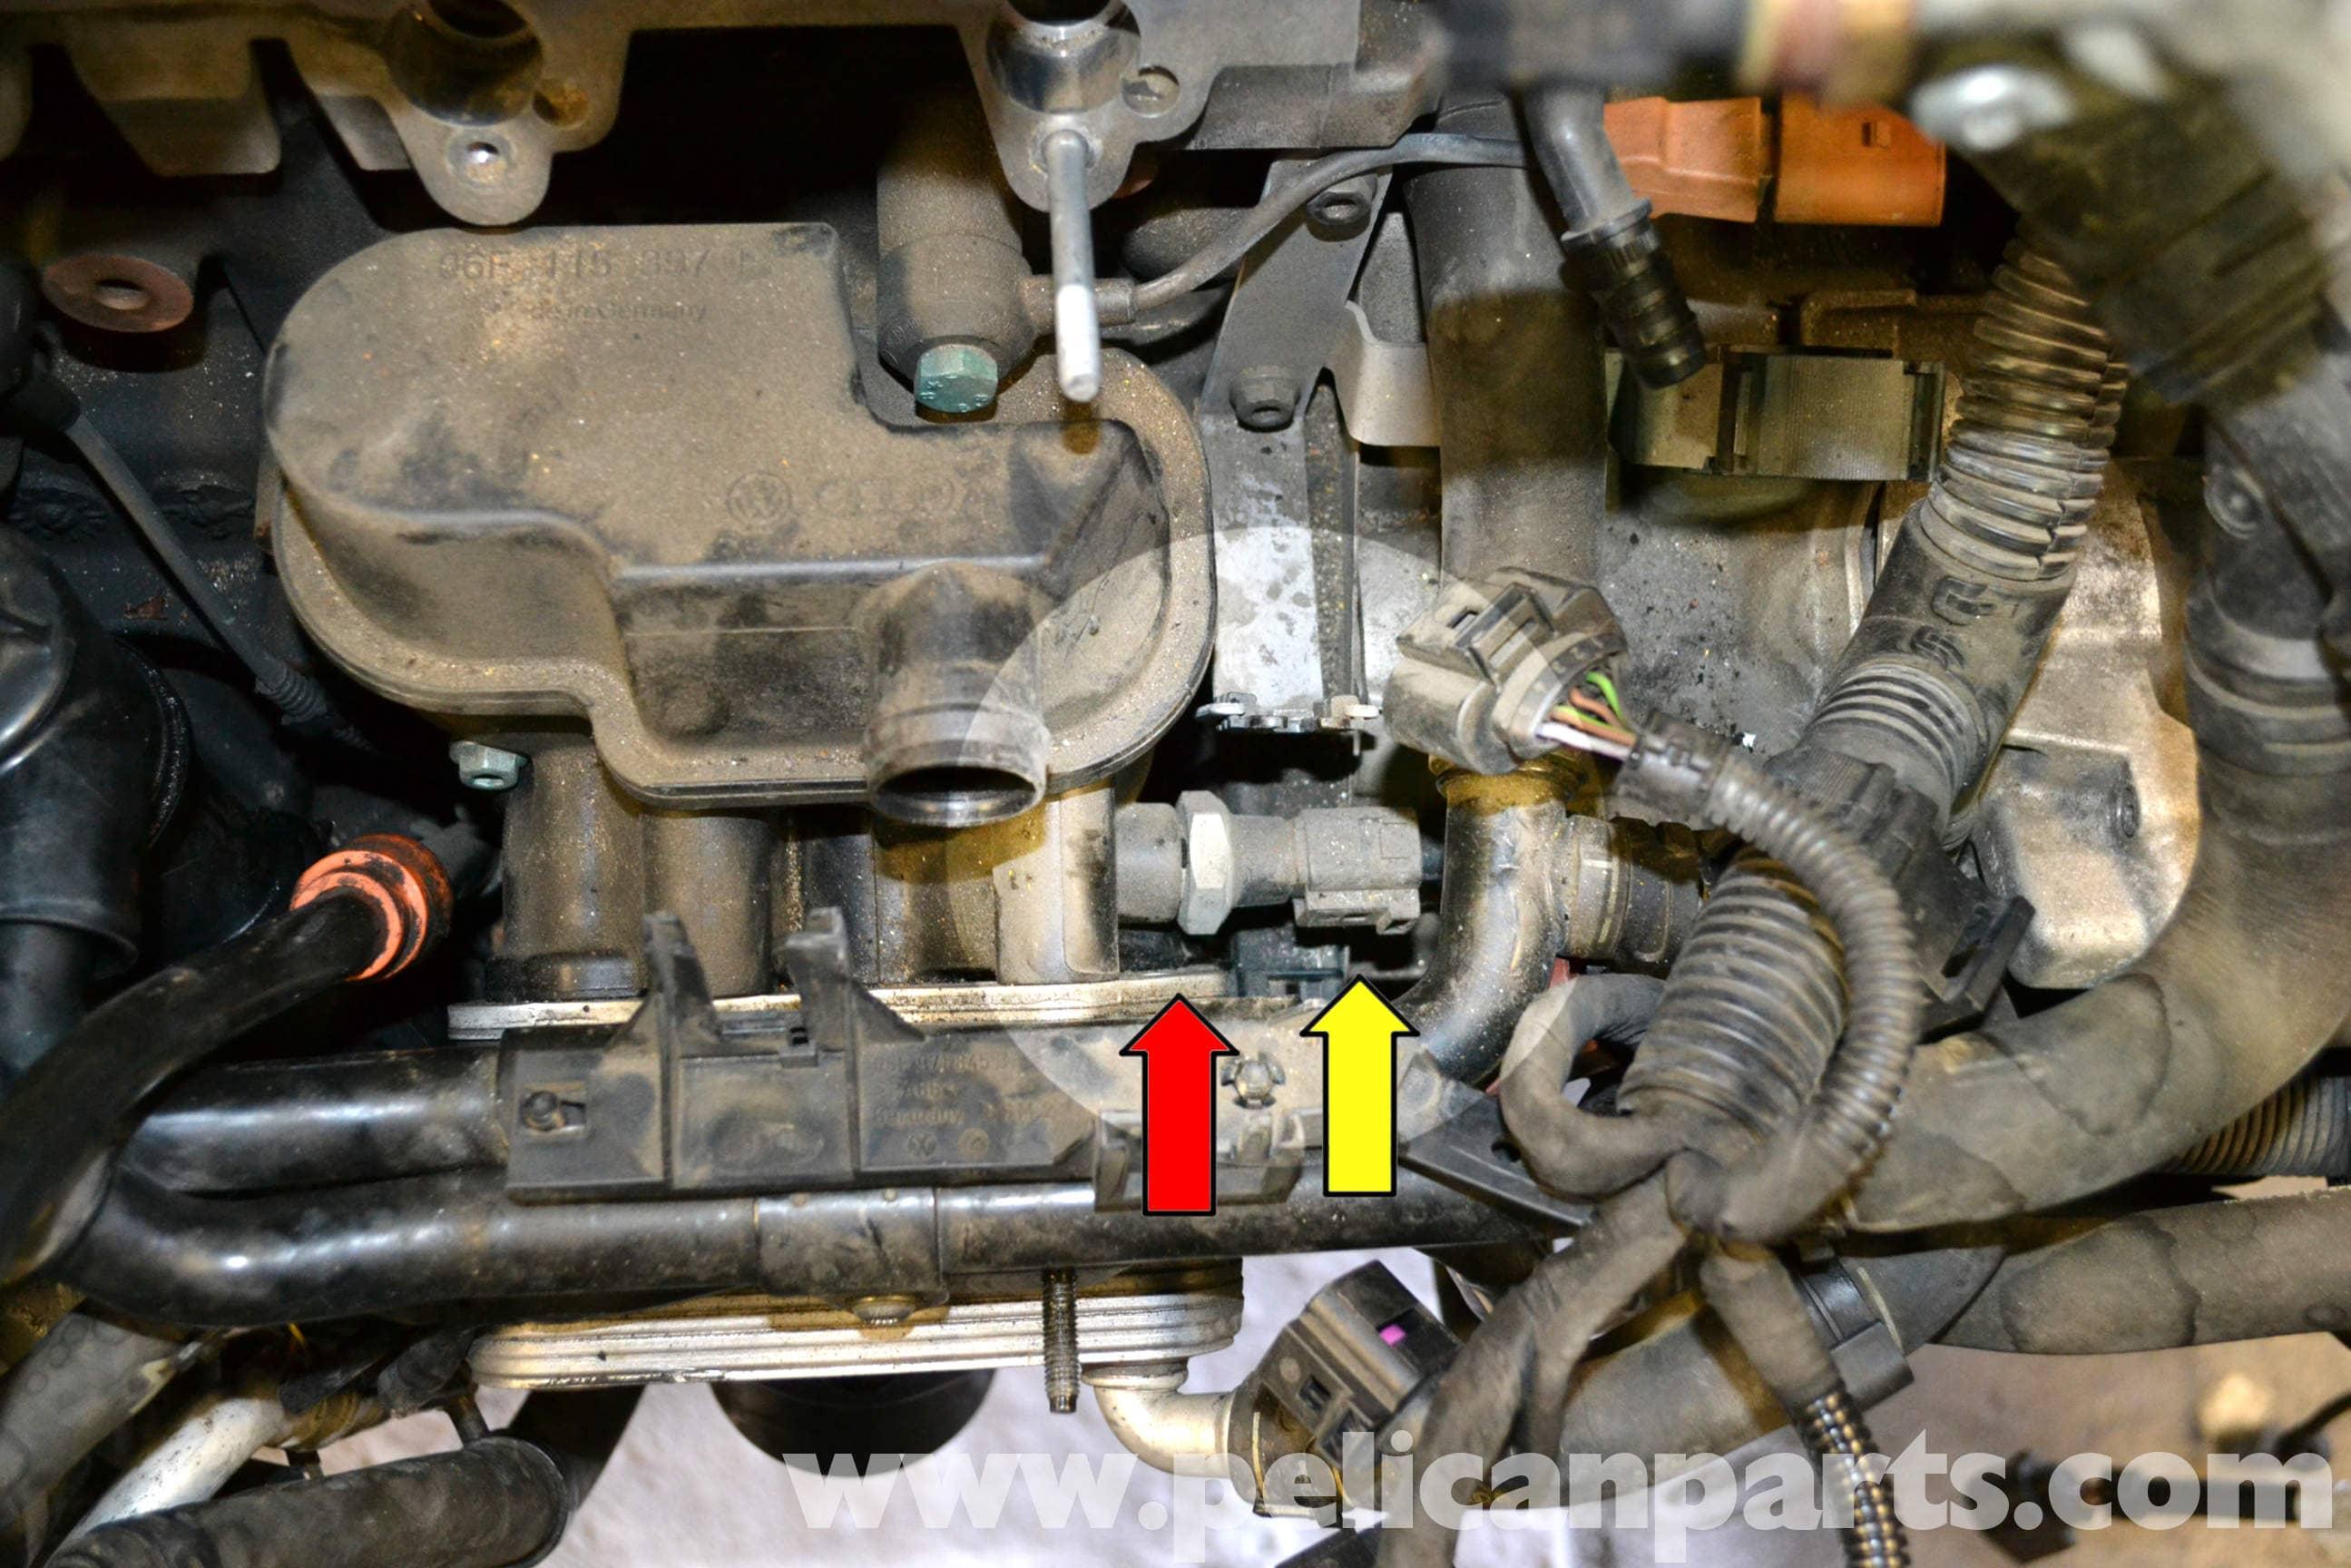 Outstanding Volkswagen Golf Gti Mk V Oil Pressure Switch Replacement 2006 2009 Wiring Cloud Loplapiotaidewilluminateatxorg